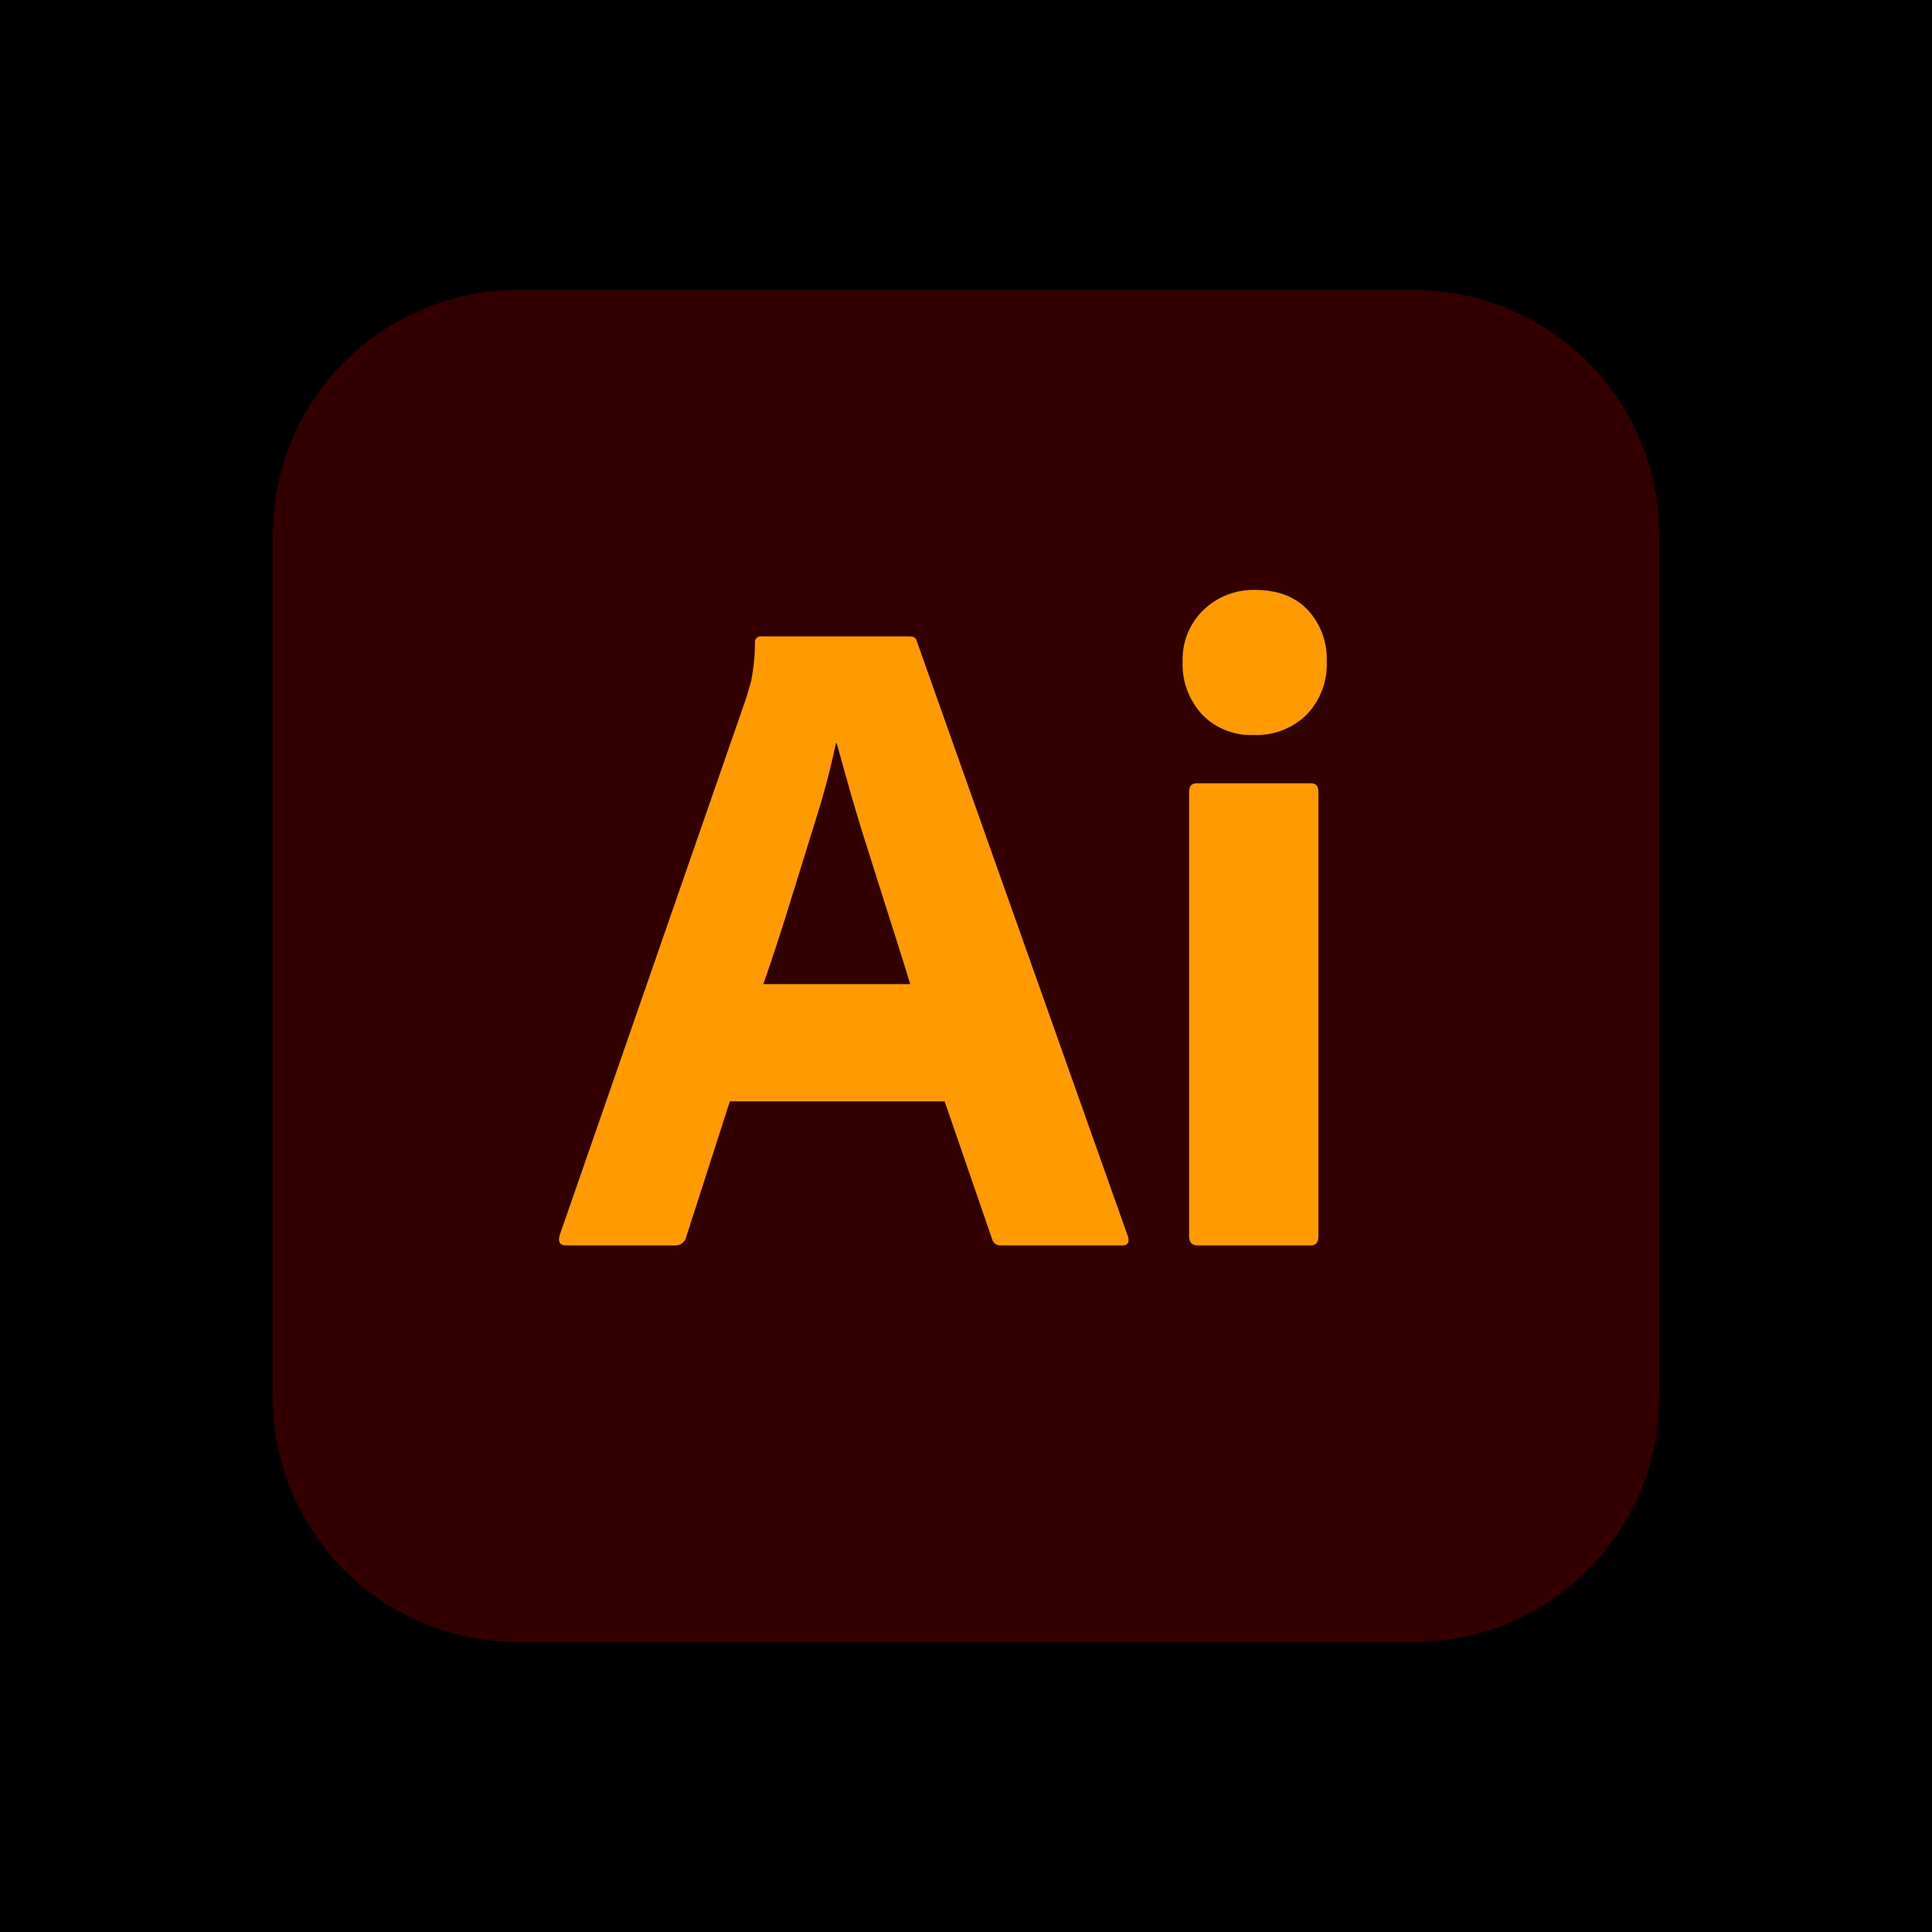 adobe Illustrator logo 0 1 - Adobe Illustrator Logo